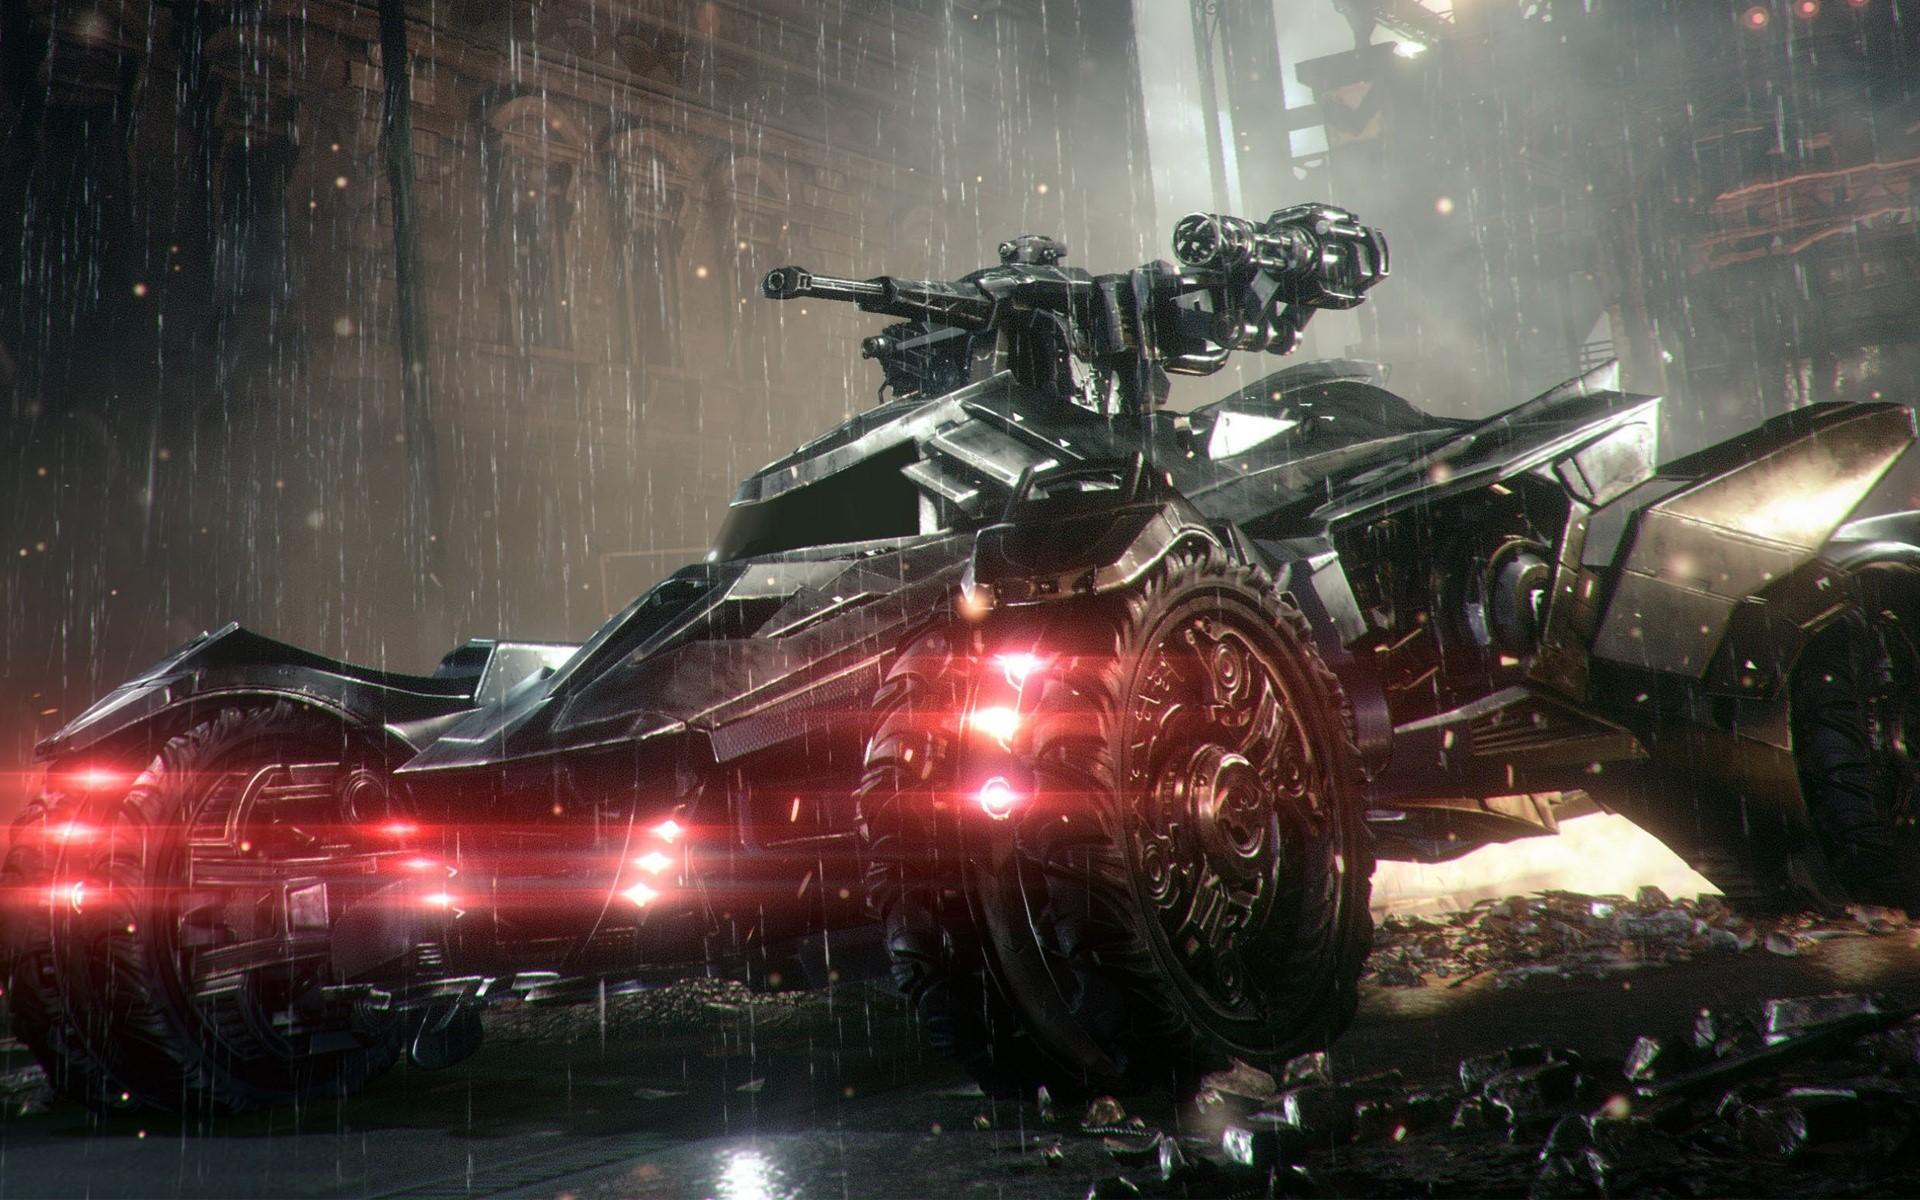 Wallpaper Batmobilen in Arkham Knight